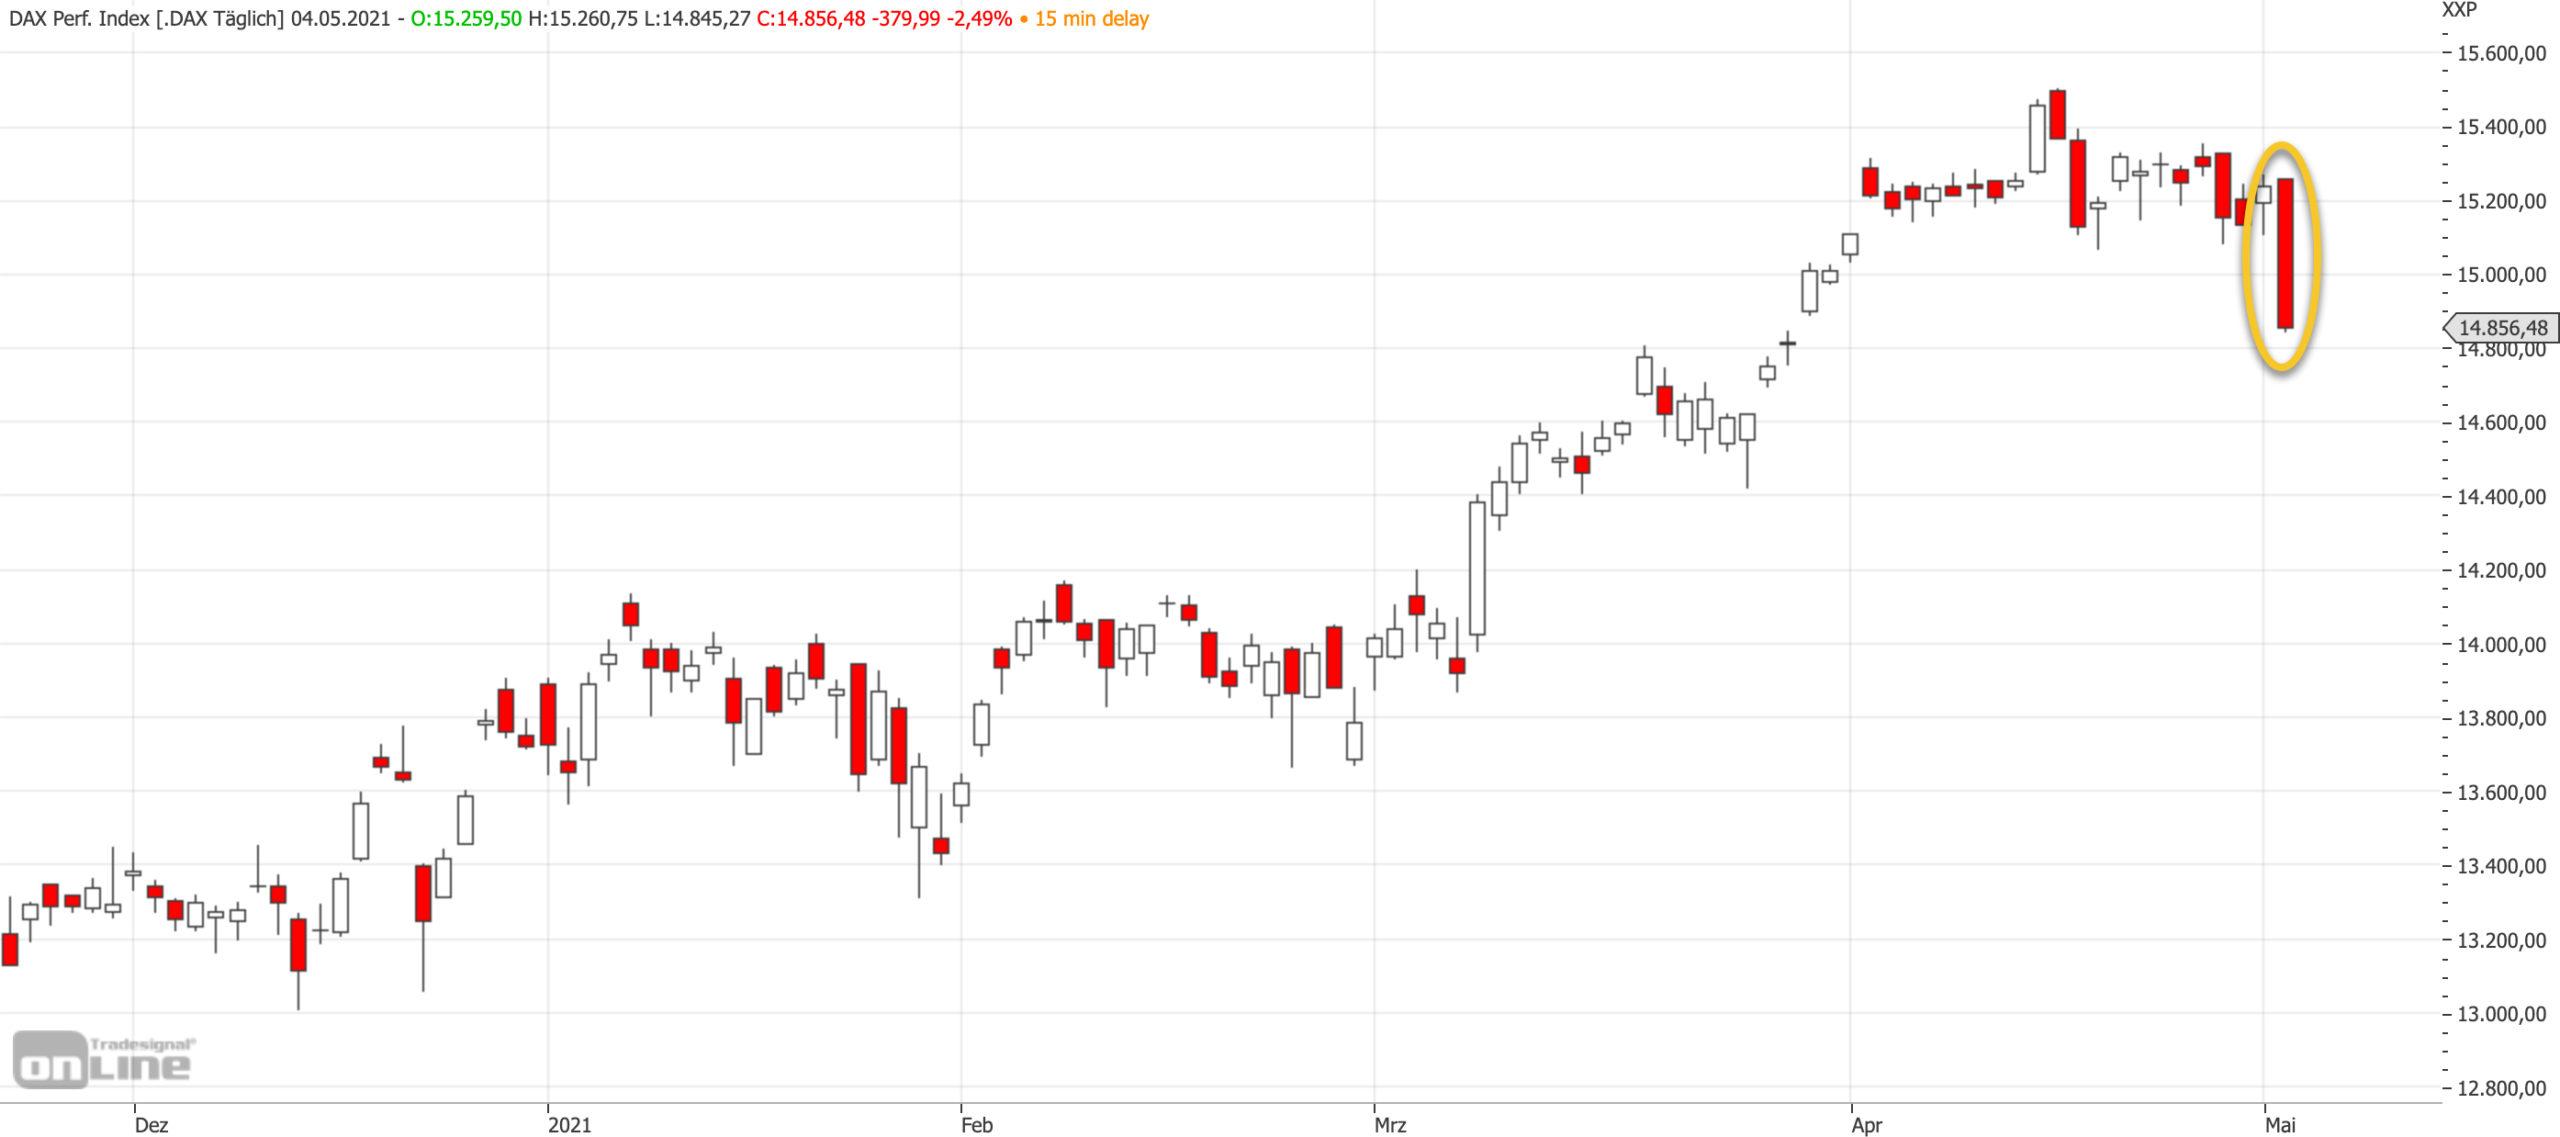 Mittelfristiger DAX-Chart am 04.05.2021